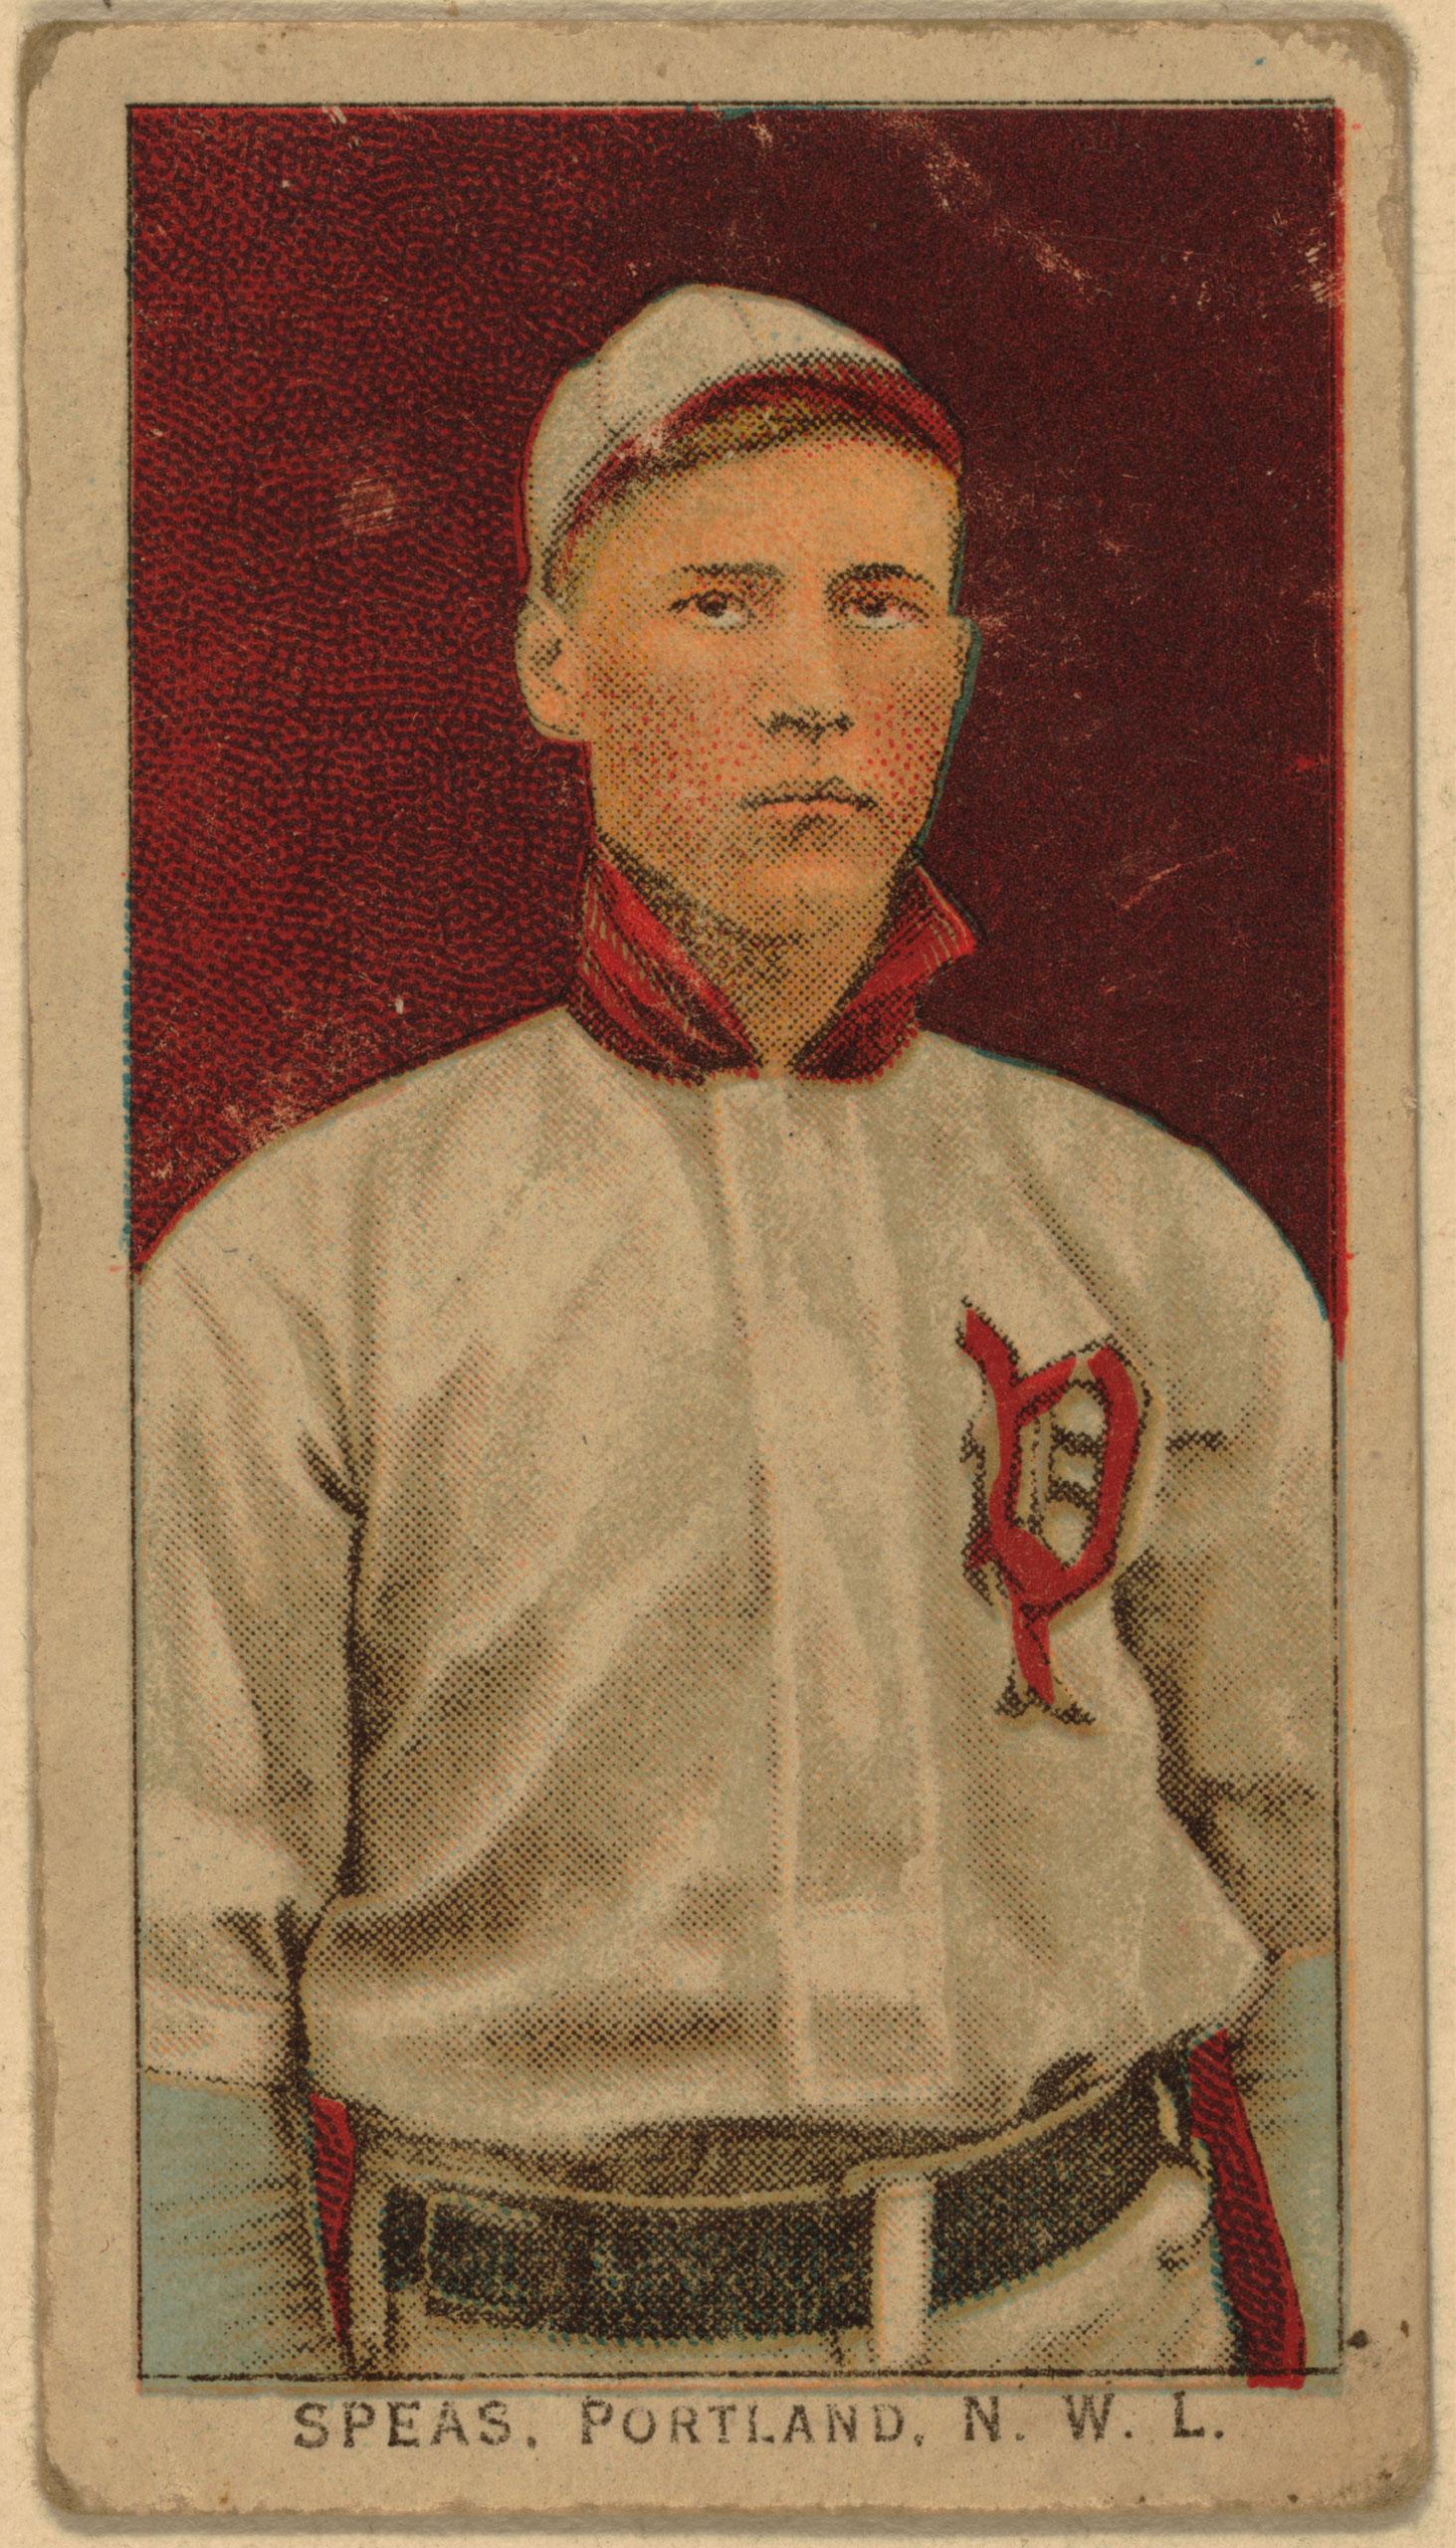 Speas, Portland Team, baseball card, 1911.